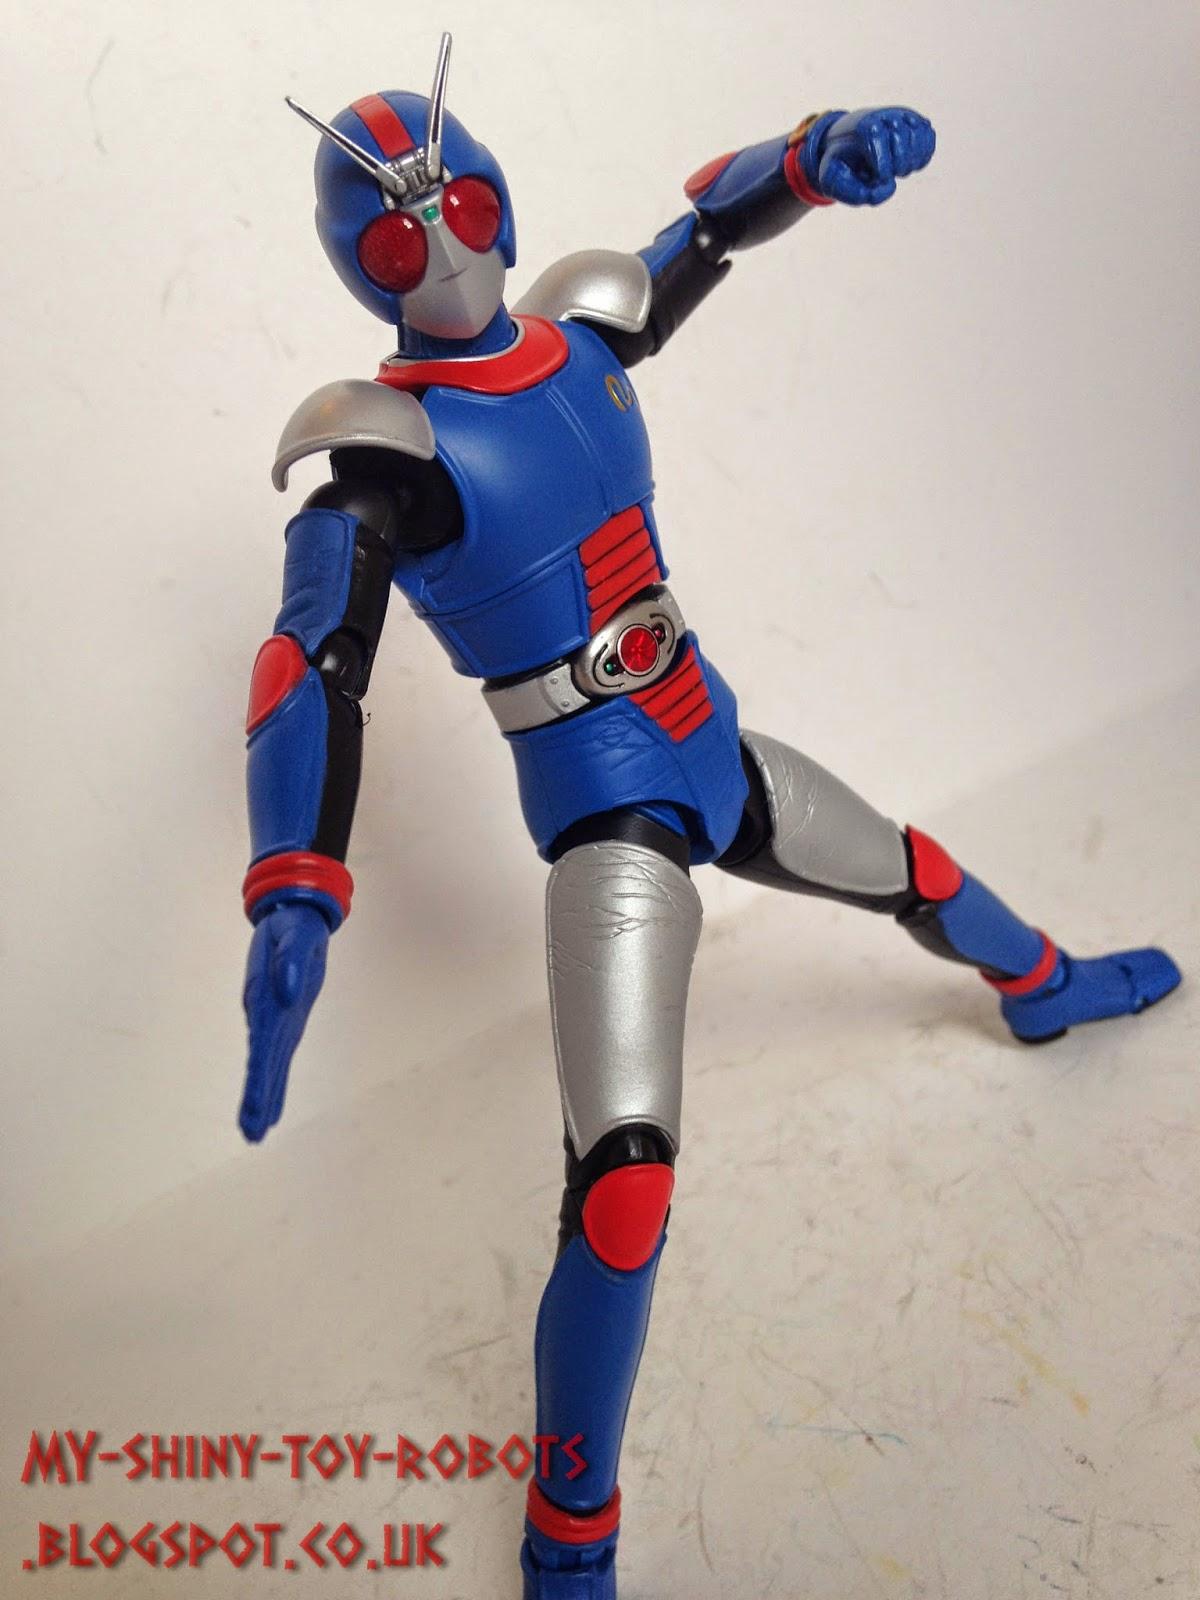 Posing Biorider